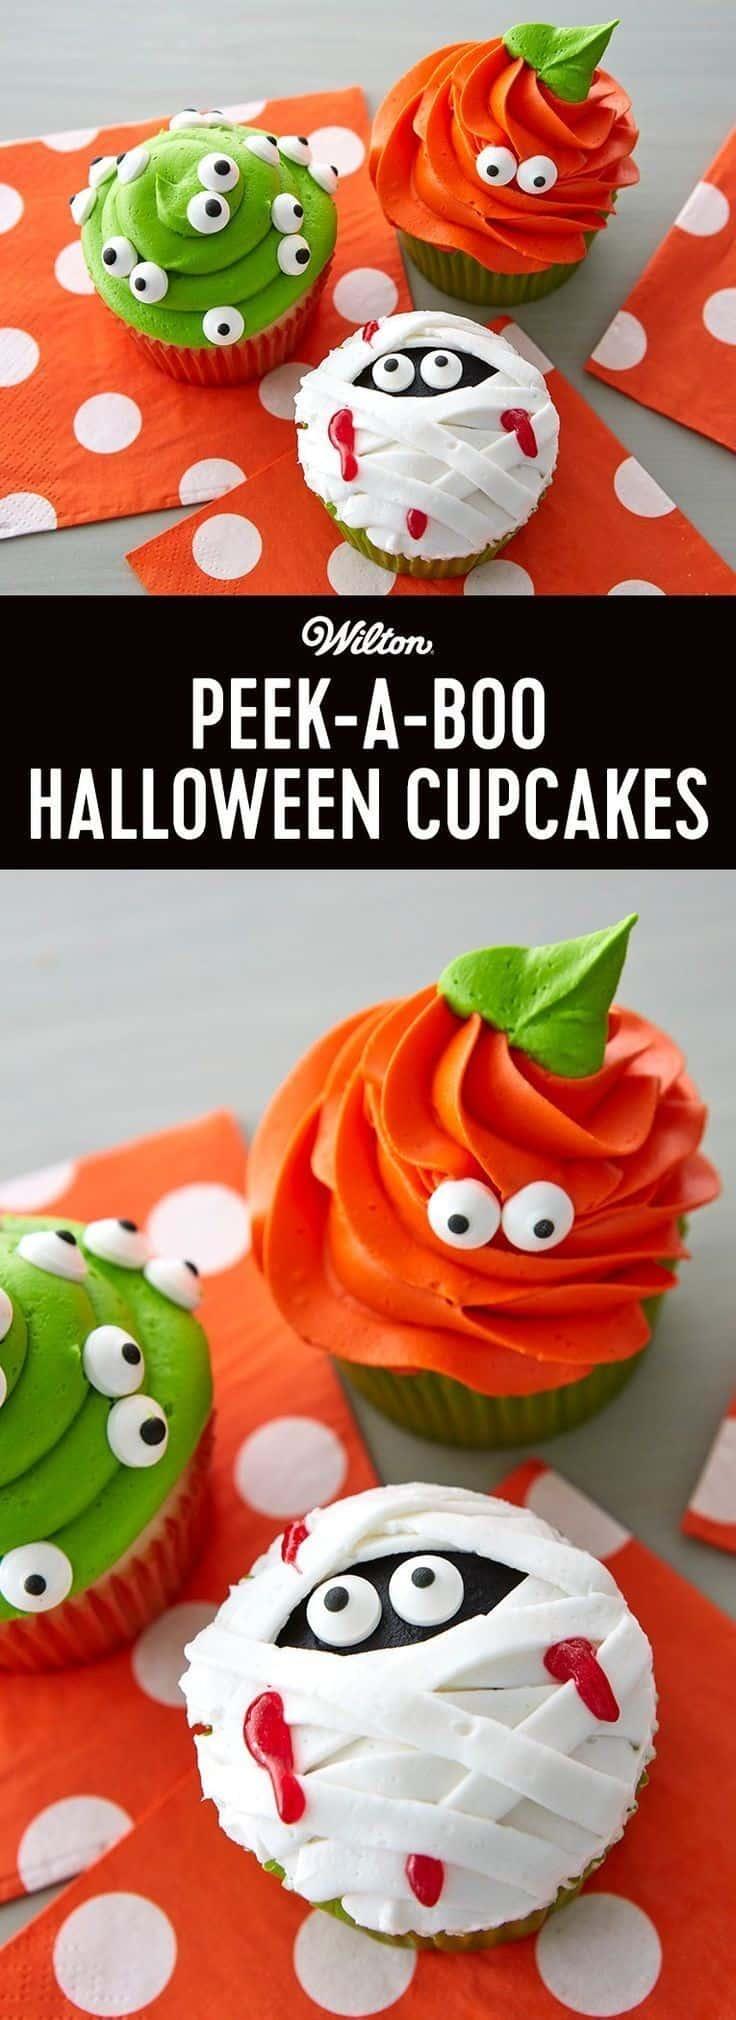 Peek-A-Boo Halloween Cupcakes